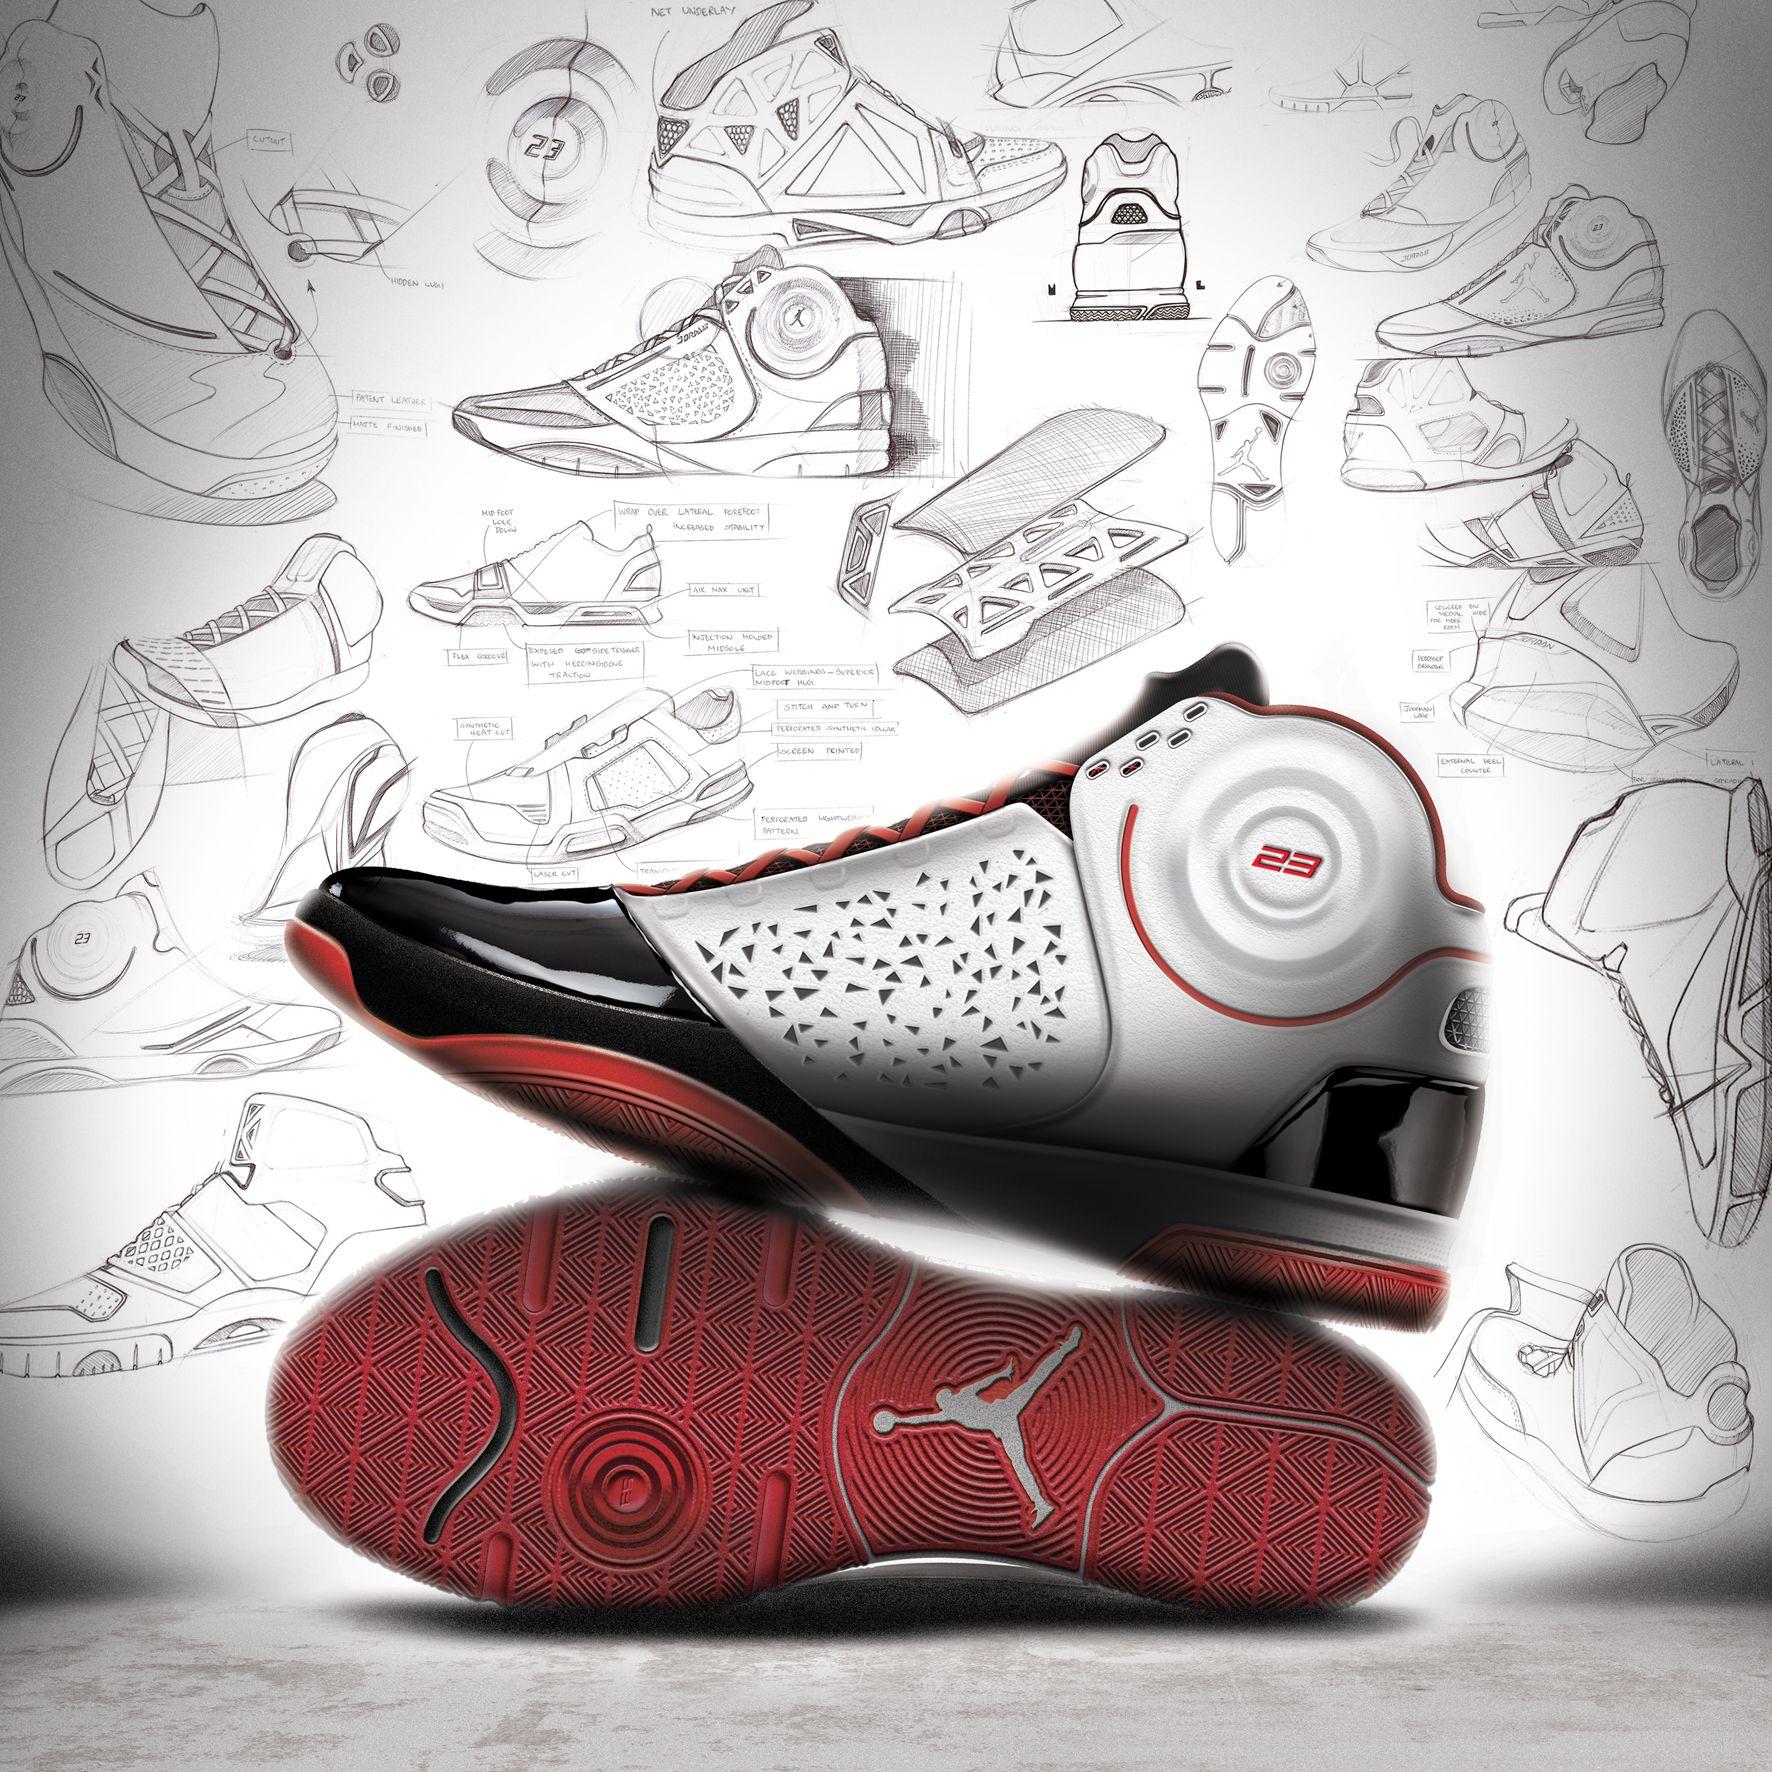 nike roshe air - Air Jordan 23 Nike Basketball Shoes Brand | Brands | Pinterest ...